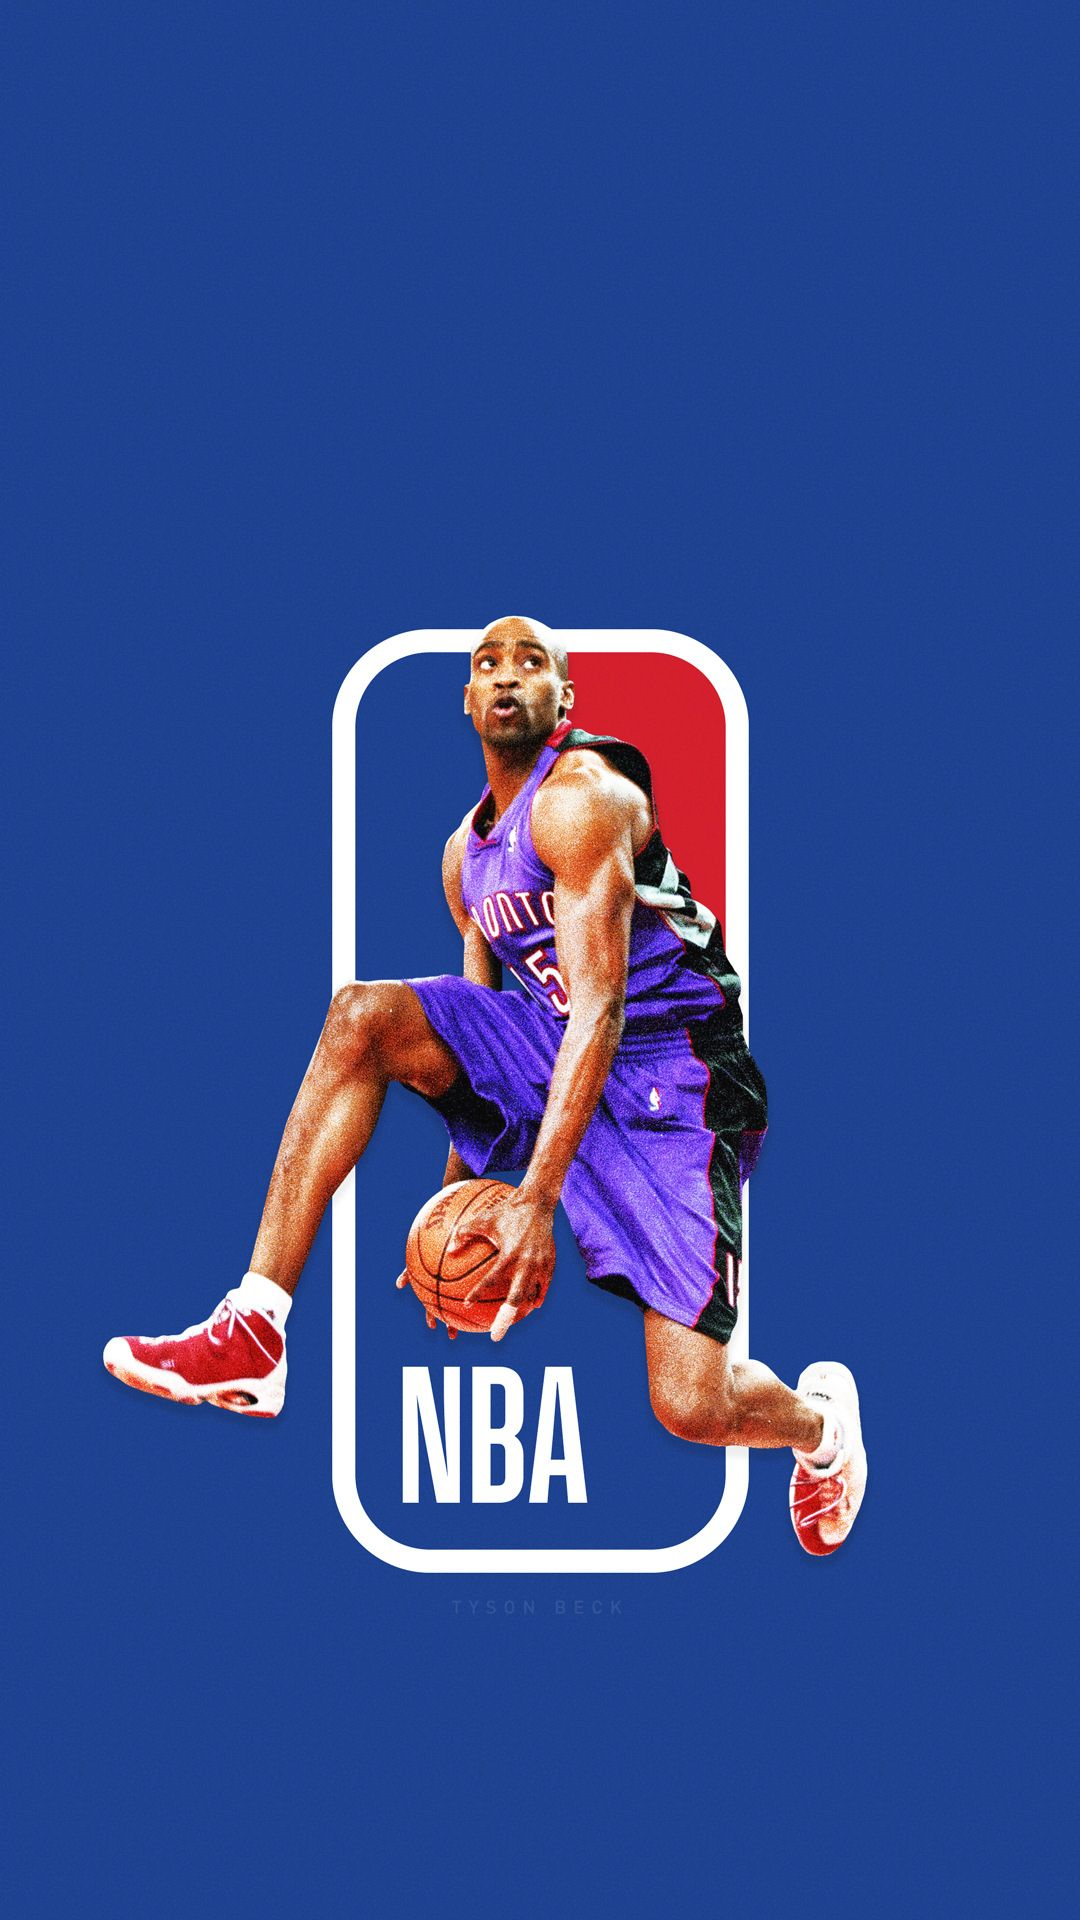 The Next NBA logo? NBA Logoman Series on Behance【2020